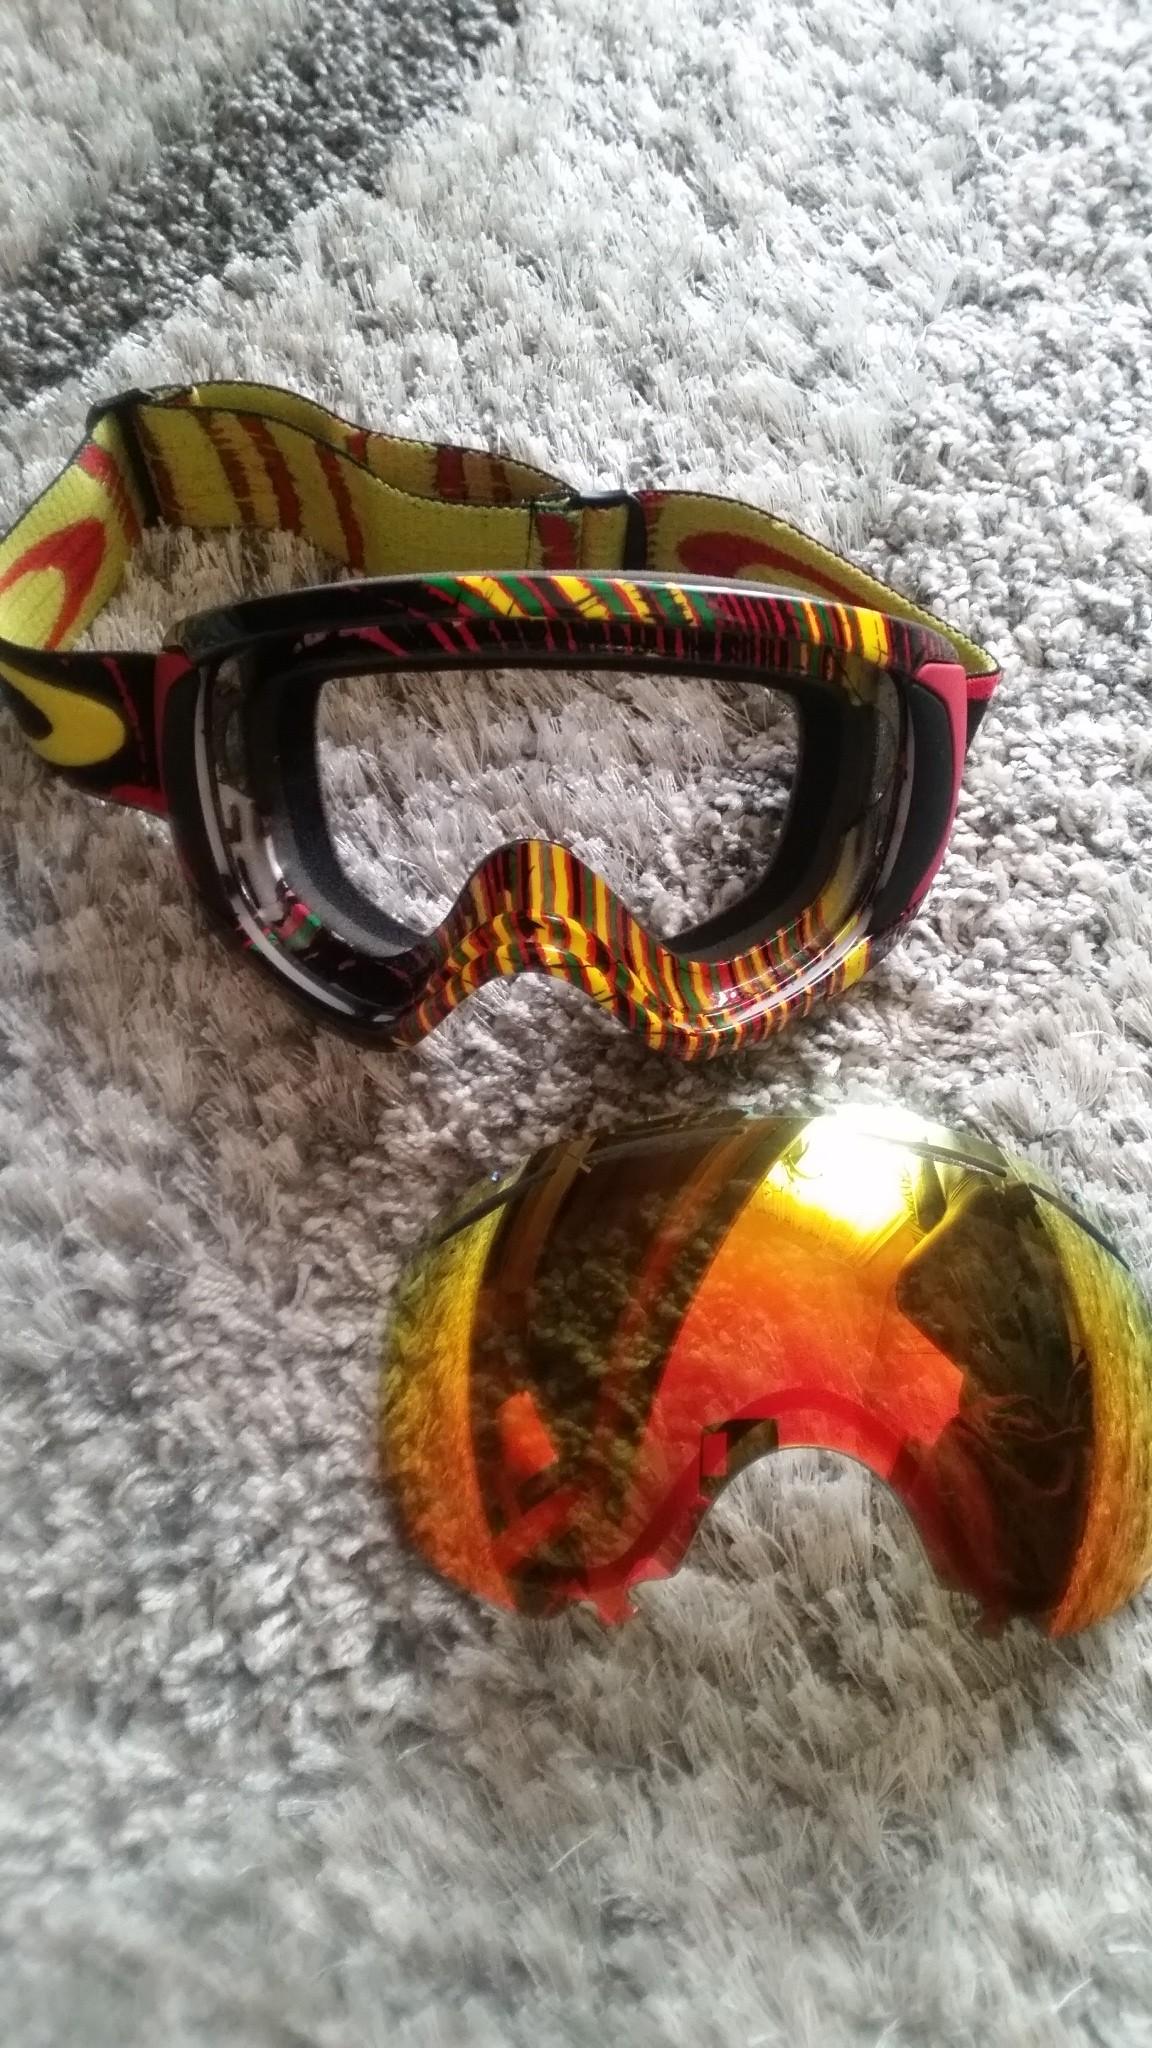 oakley mask bg50  oakley Canopy Fire Iridium oakley mask Canopy Fire Iridium